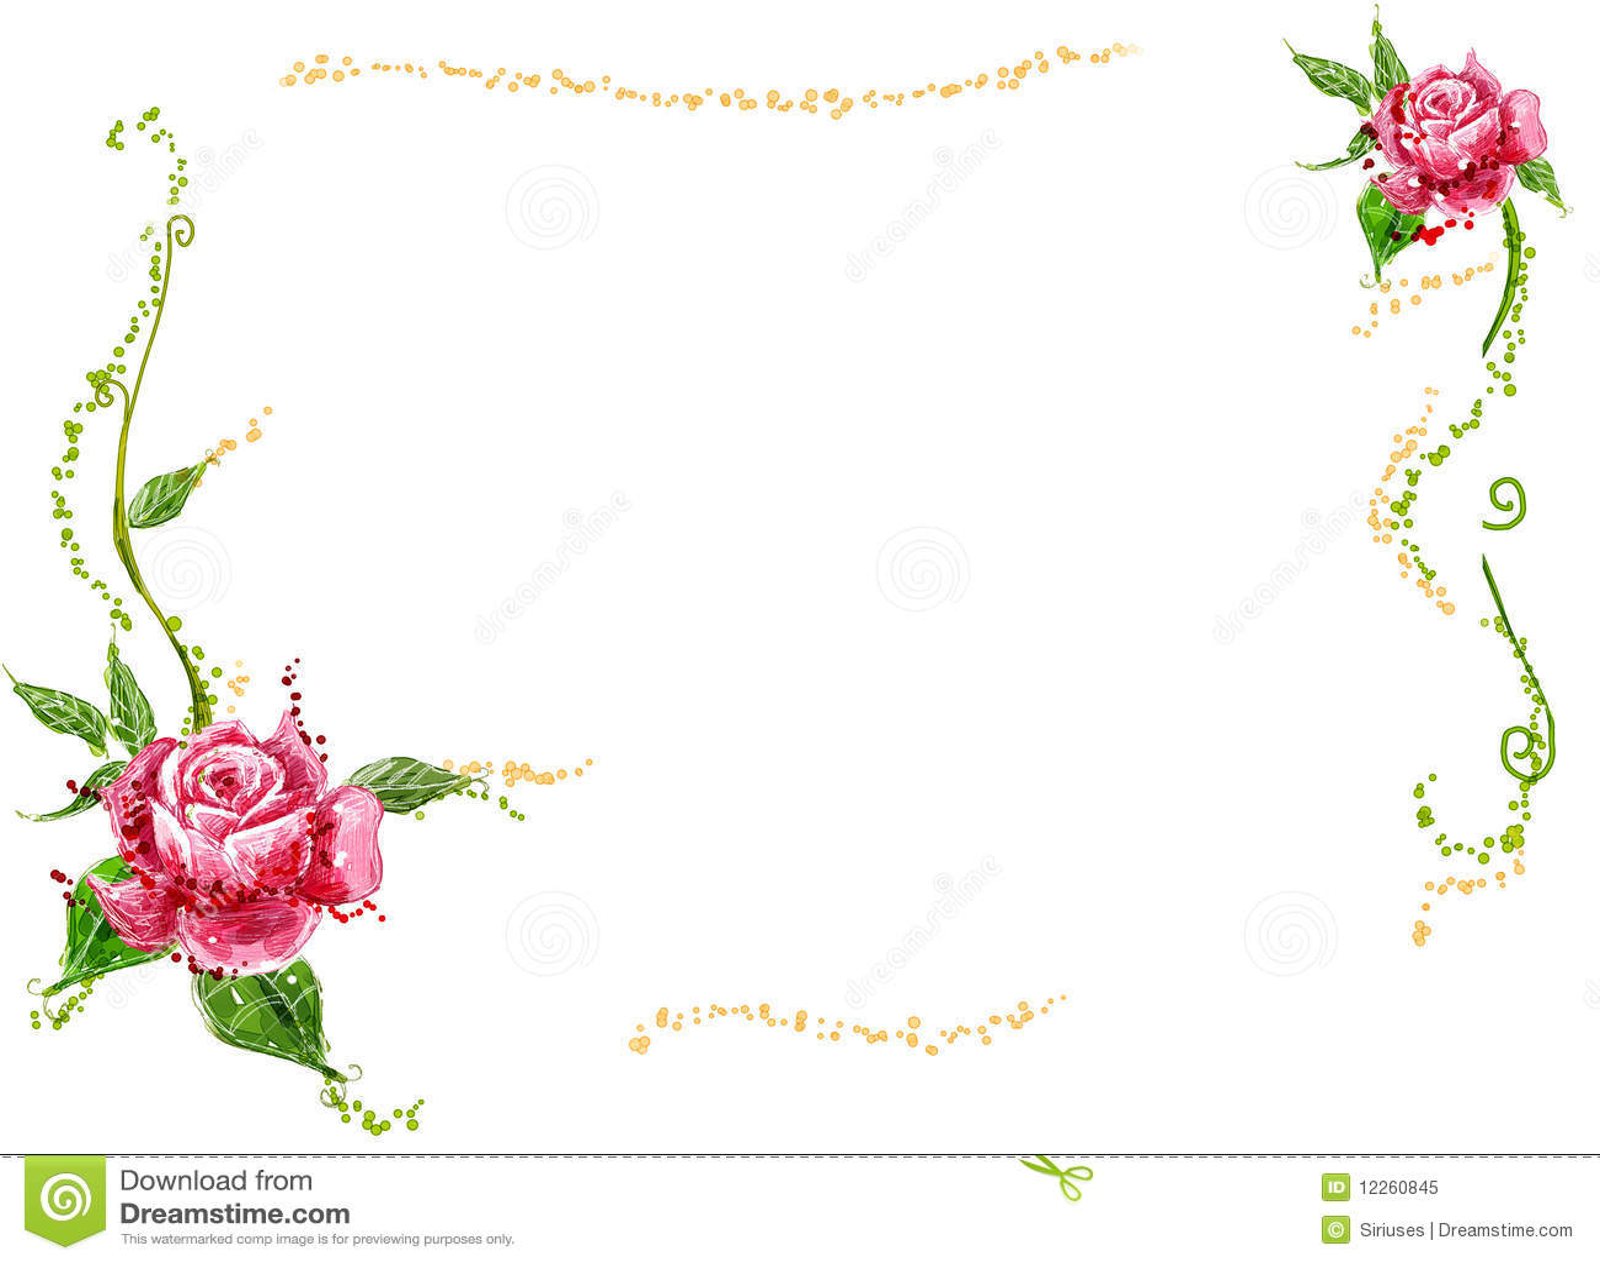 flower vines  flower, Beautiful flower